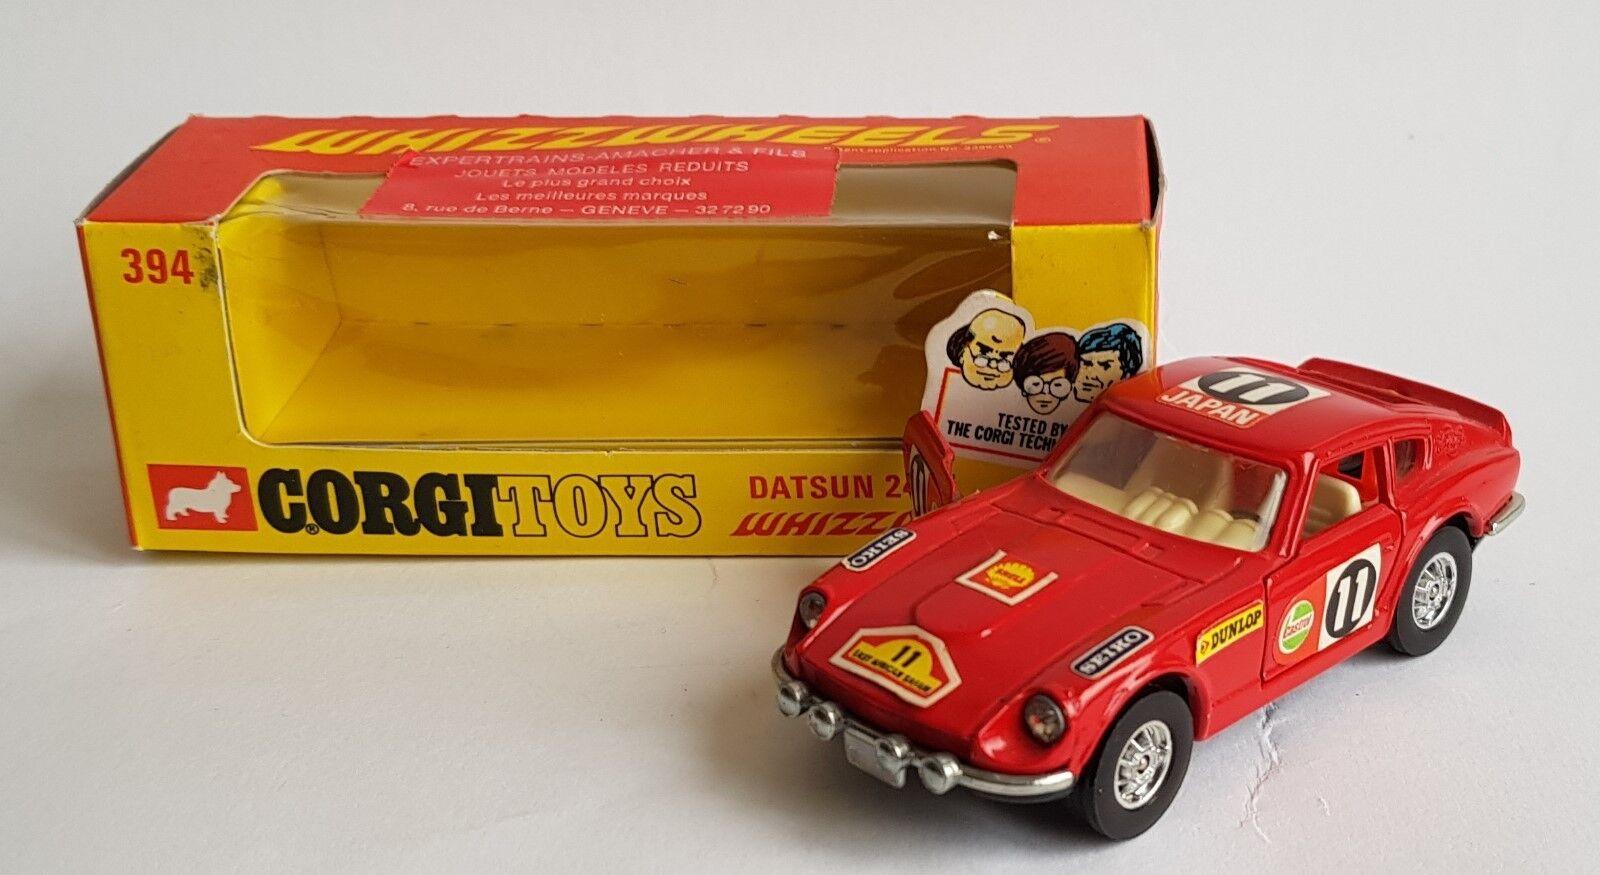 CORGI TOYS Nº 394, Datsun 240Z Whizzwheels, - SUPERBA Nuovo di zecca.